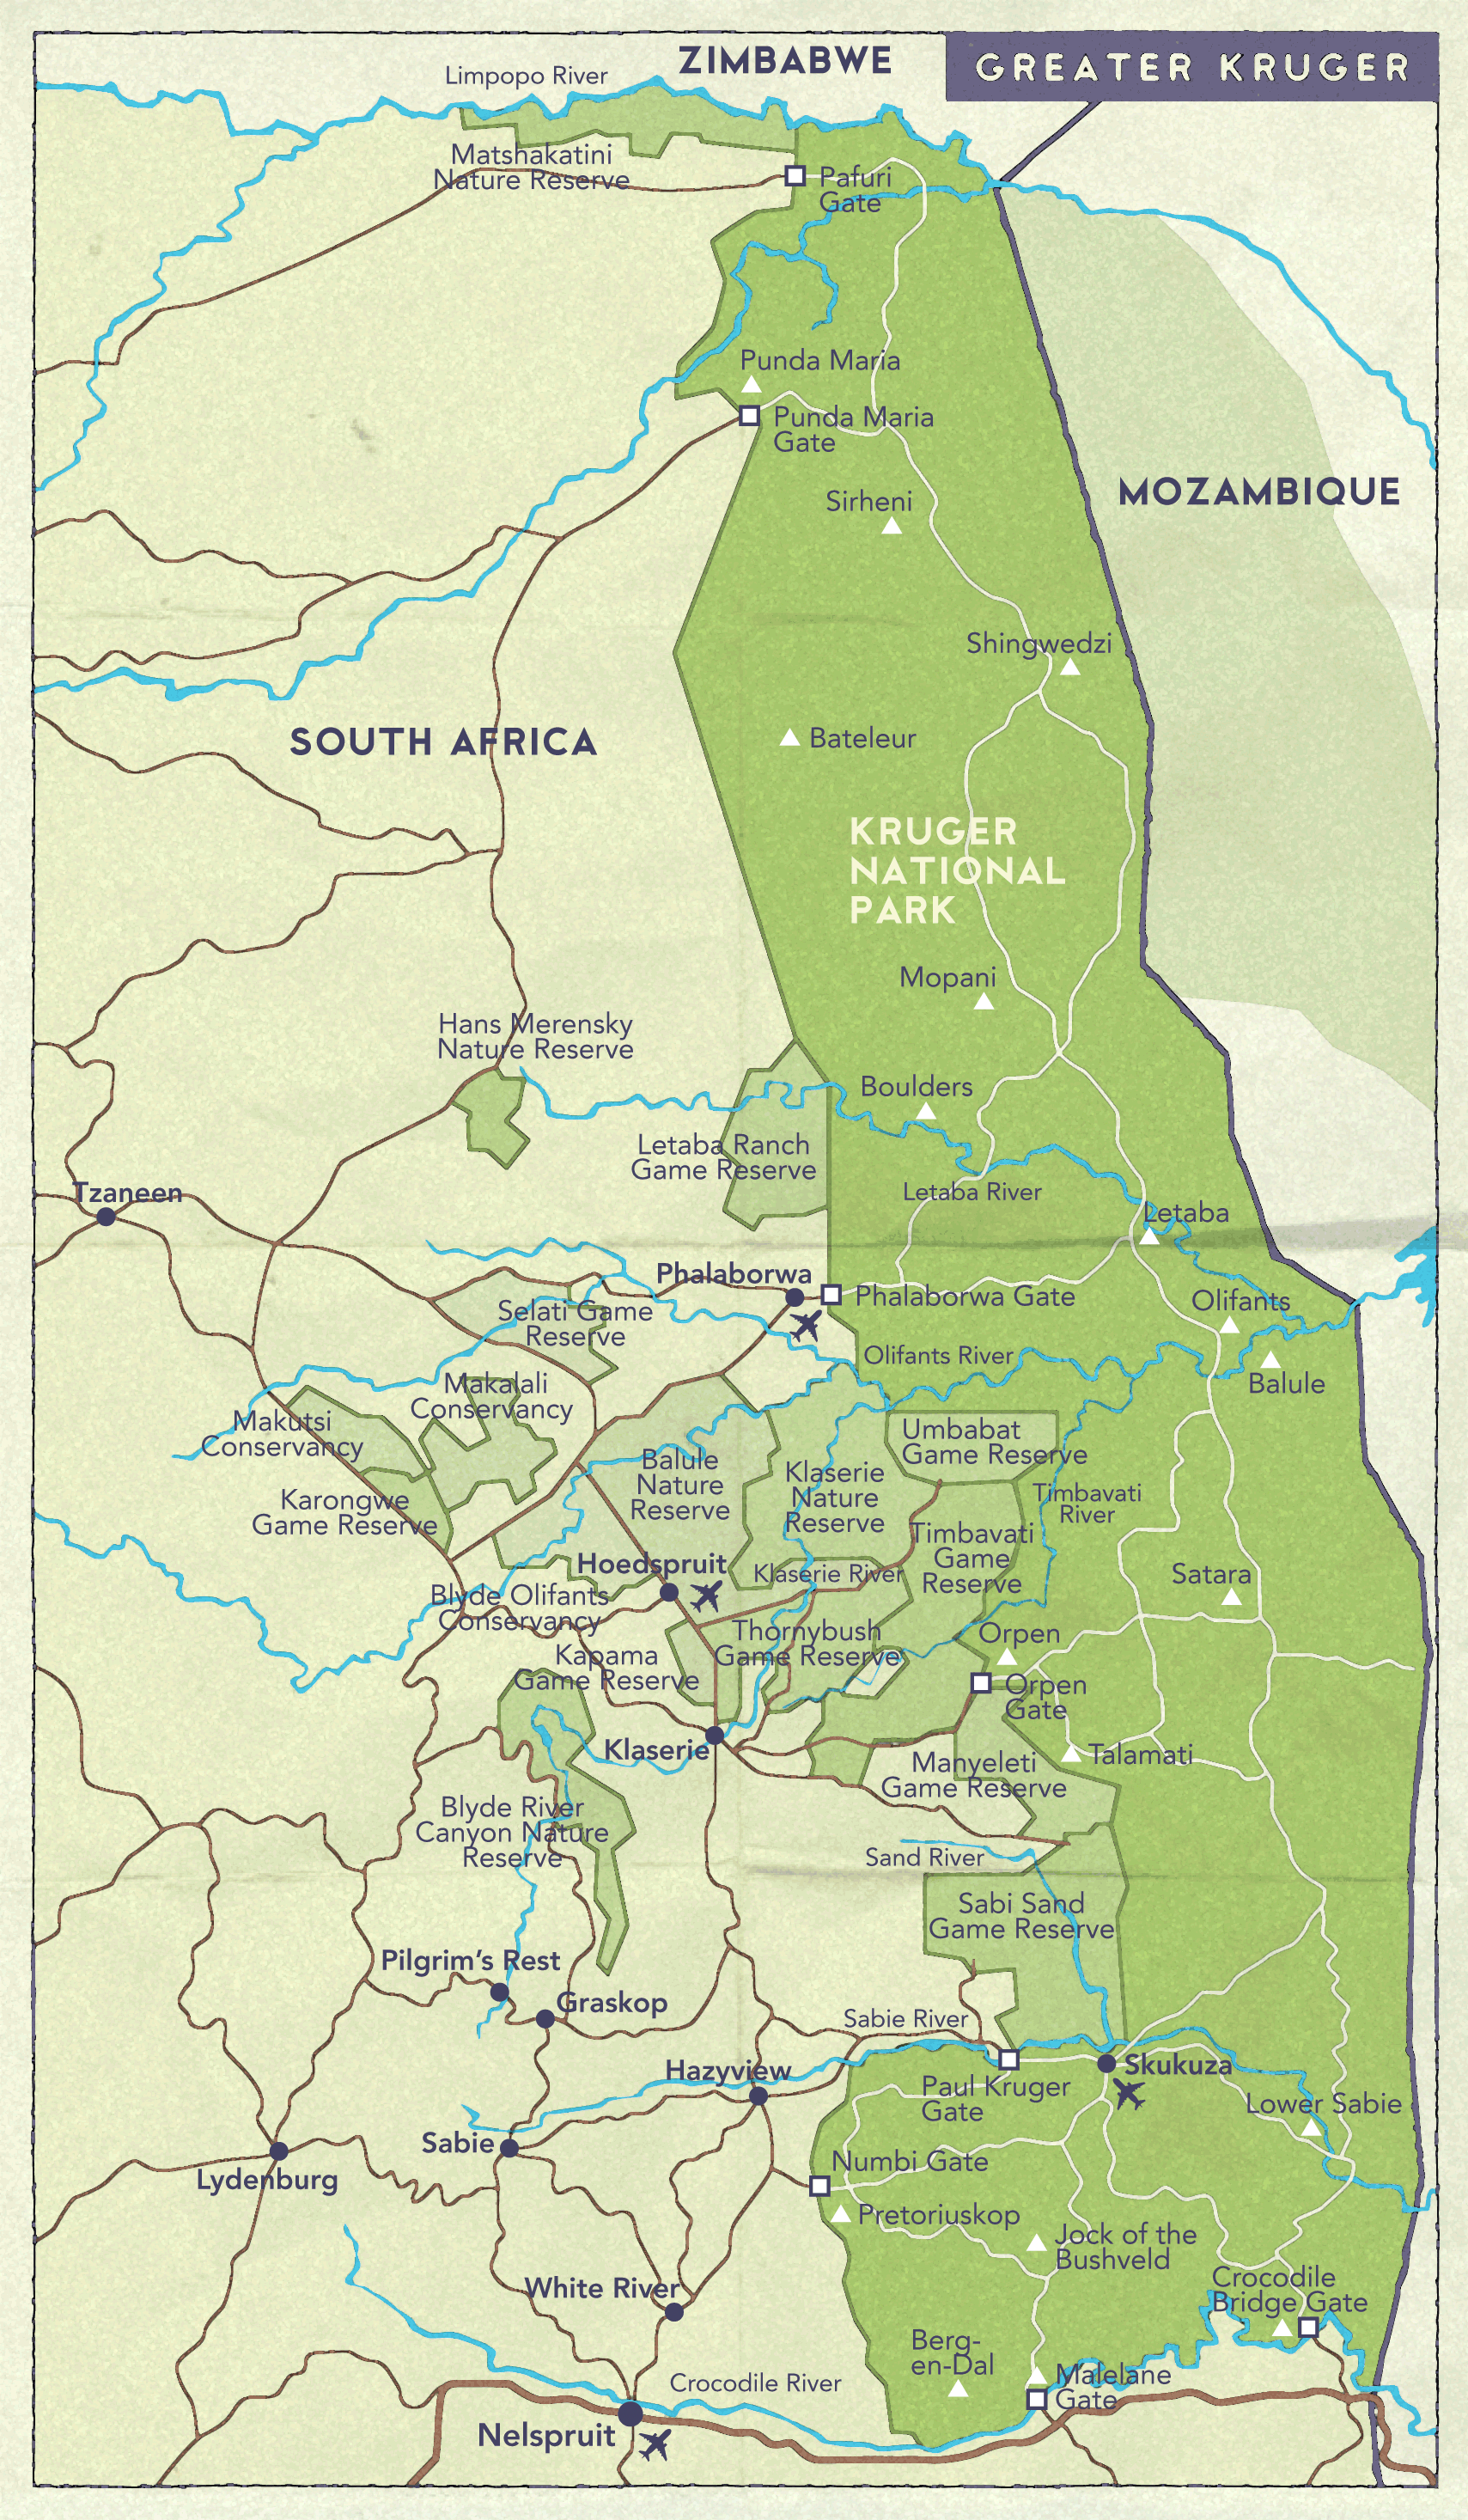 Mpumalanga | Kruger Park | Destinations | Khaki Fever Safaris on sun city map, natal map, haarlem map, caprivi strip map, rio de janeiro map, brasov map, worcester map, sharm el sheikh map, london map, port elizabeth map, pietermaritzburg map, viterbo map, gauteng map, johannesburg map, arusha map, limpopo map, democratic republic of congo map, lviv map, cape town map, garden route map,